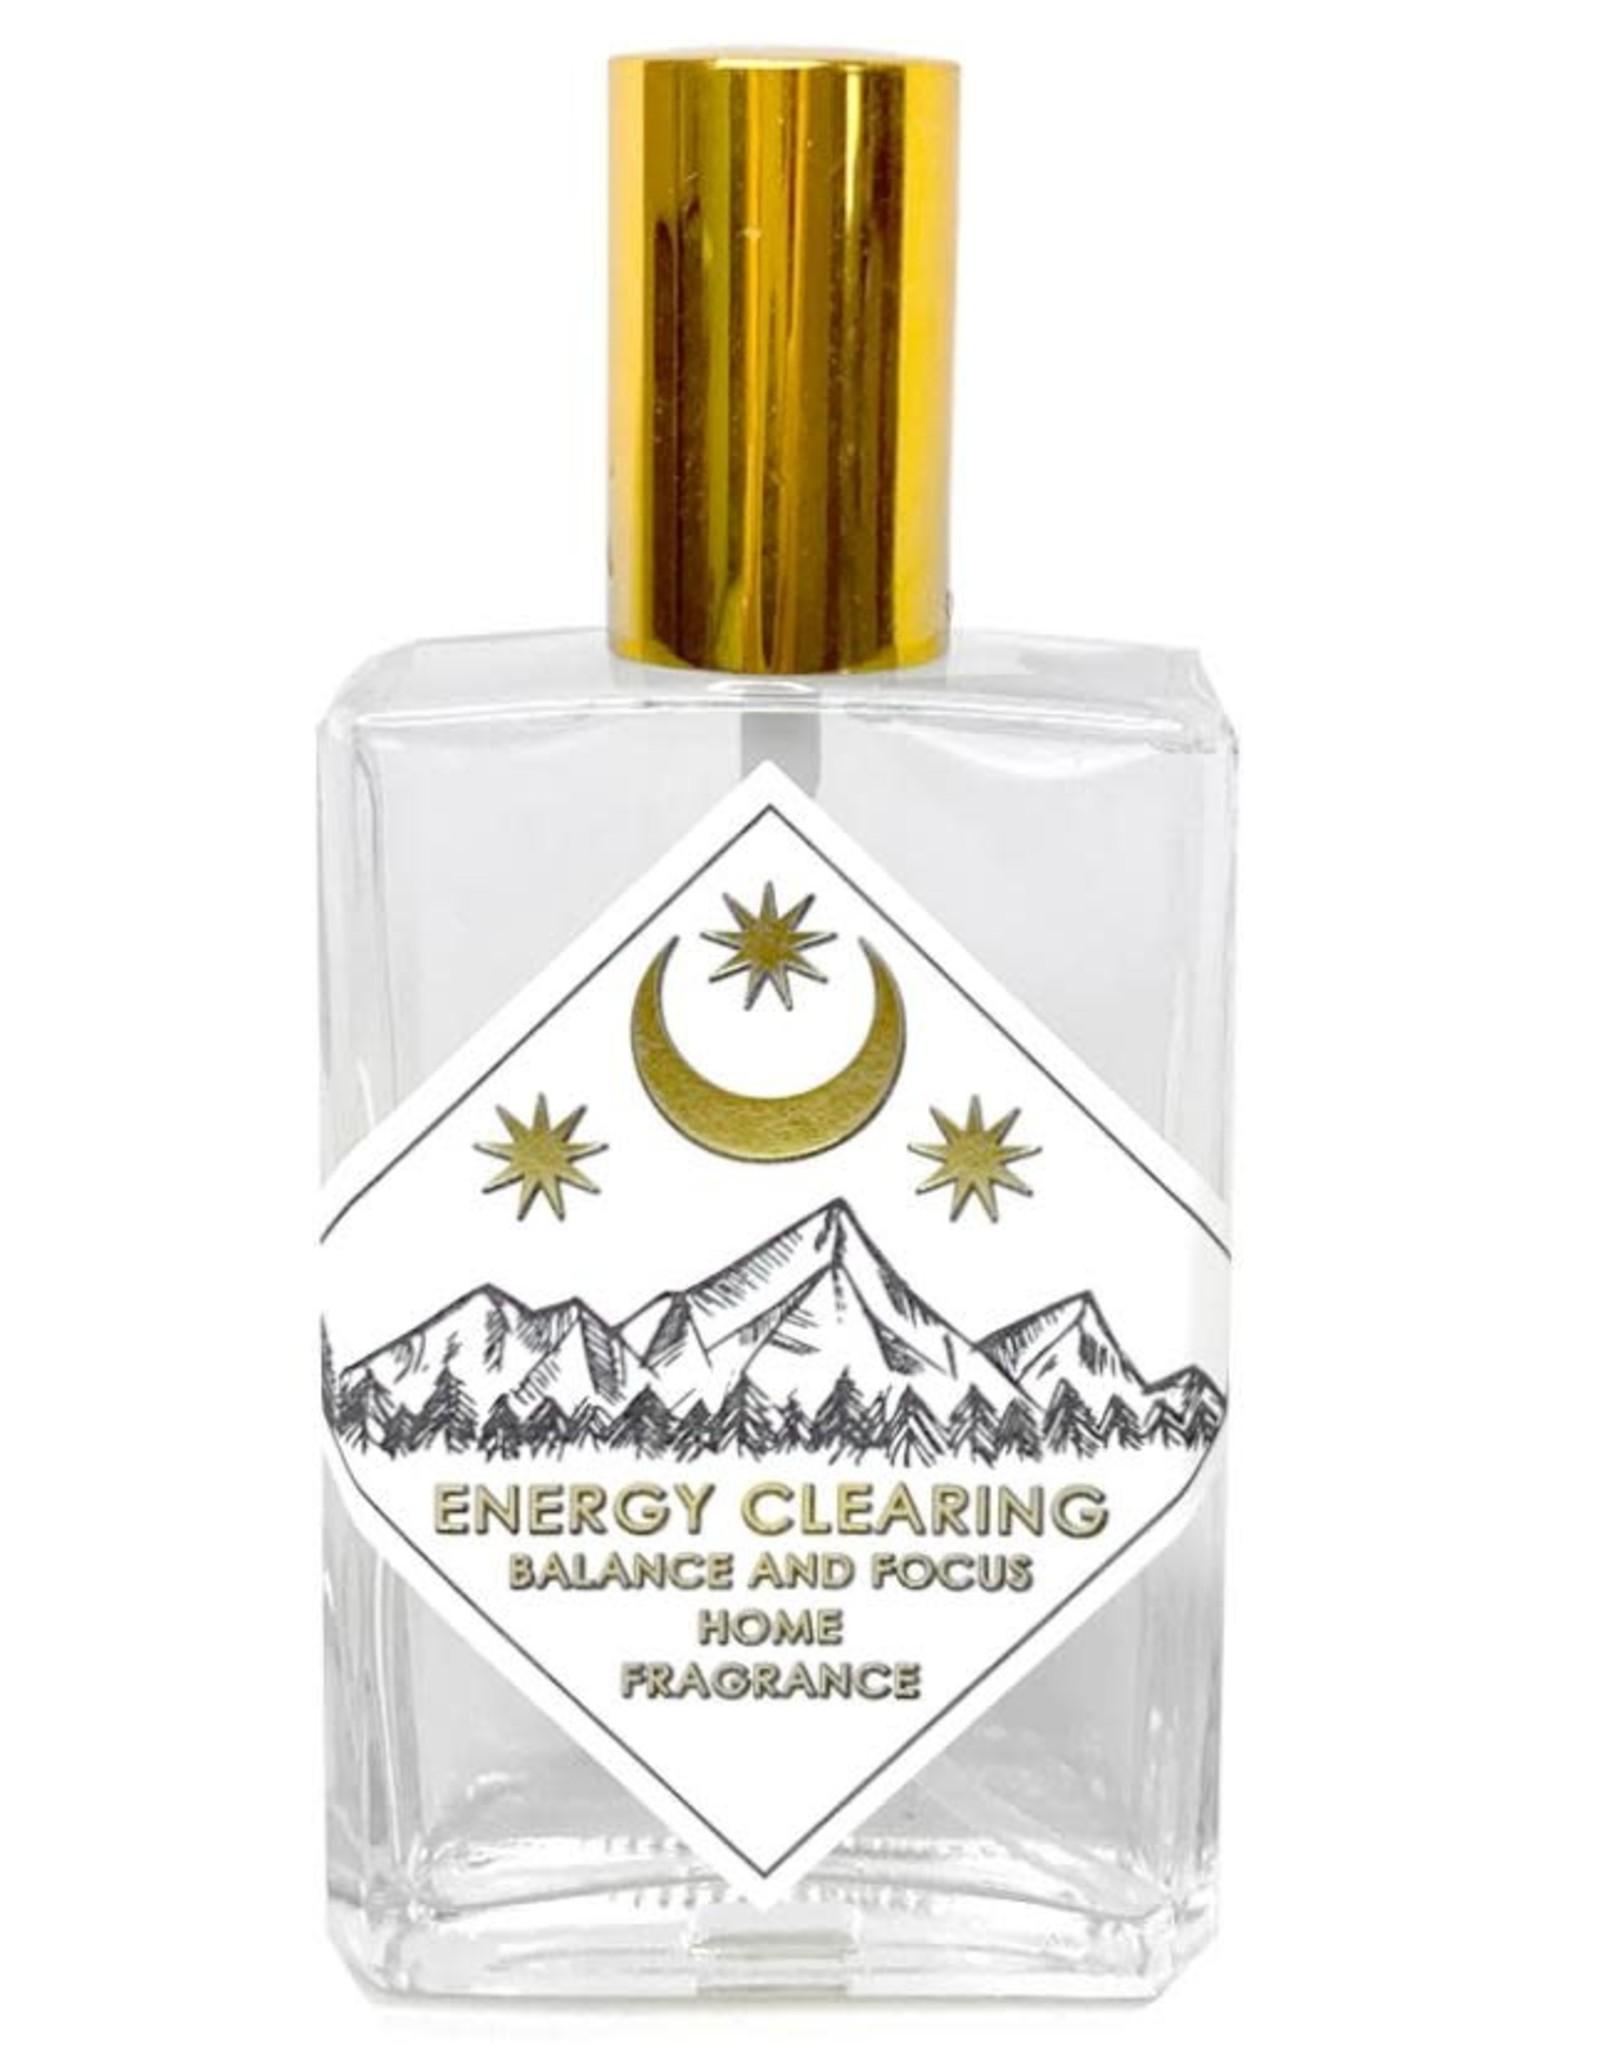 Spi-Gi Energy Clearing Home Fragrance